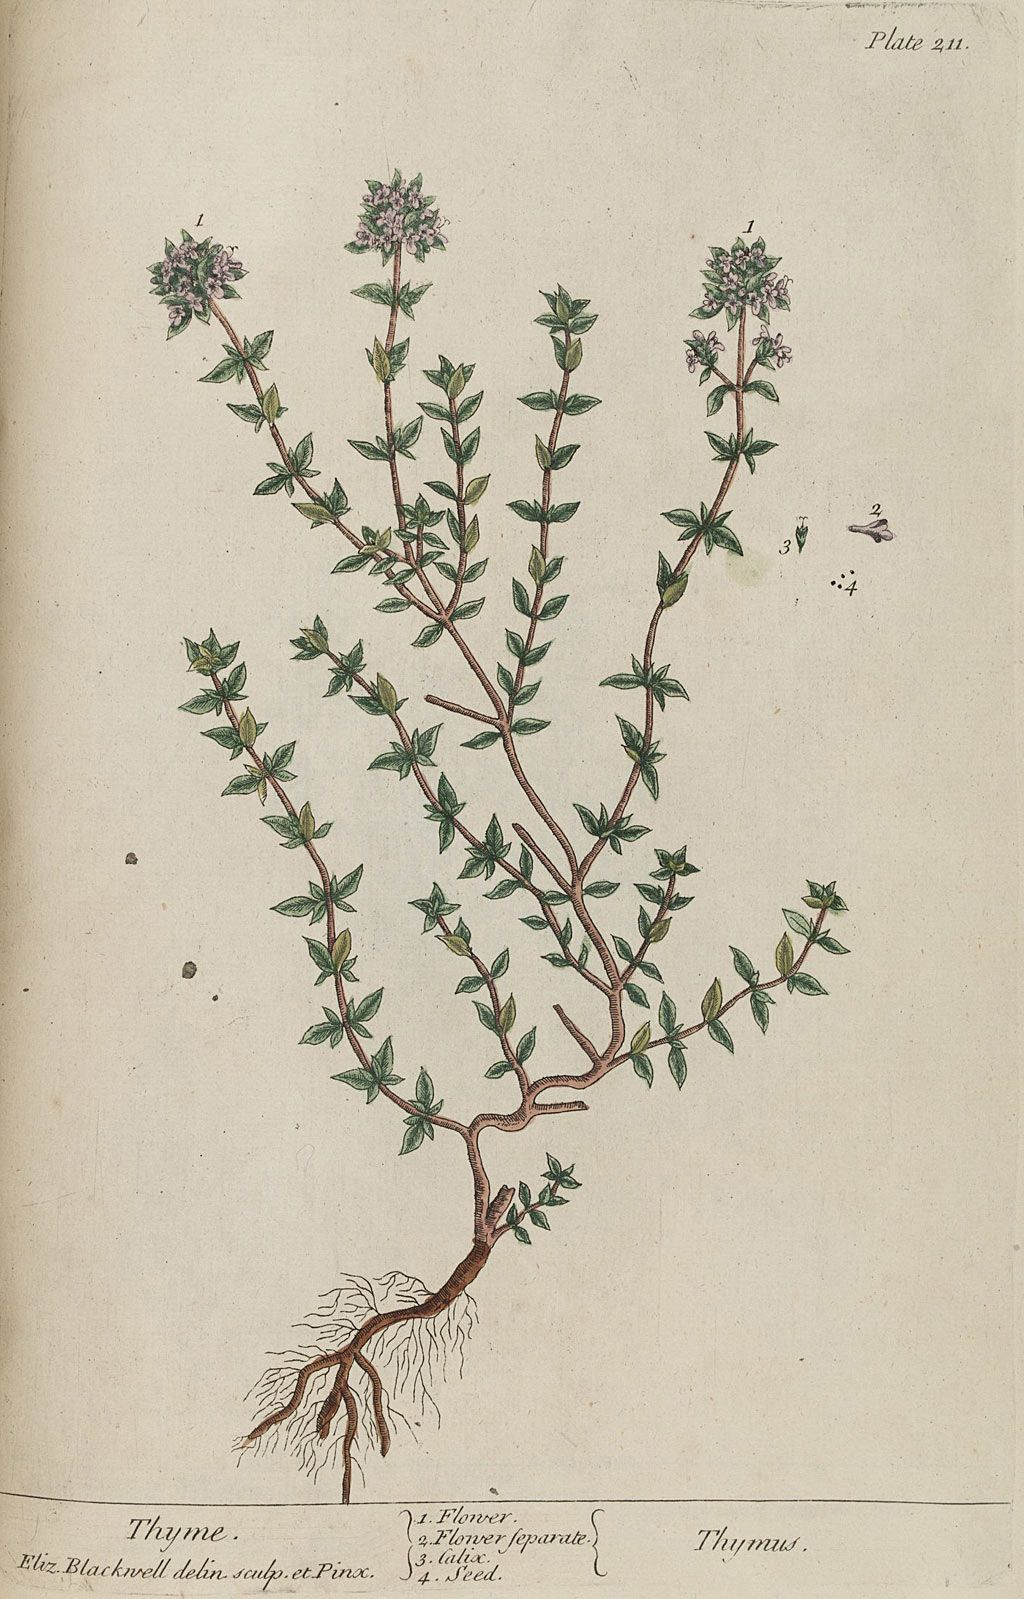 thymus serpyllum | Xerofyty 2 | Pinterest | Thymus serpyllum